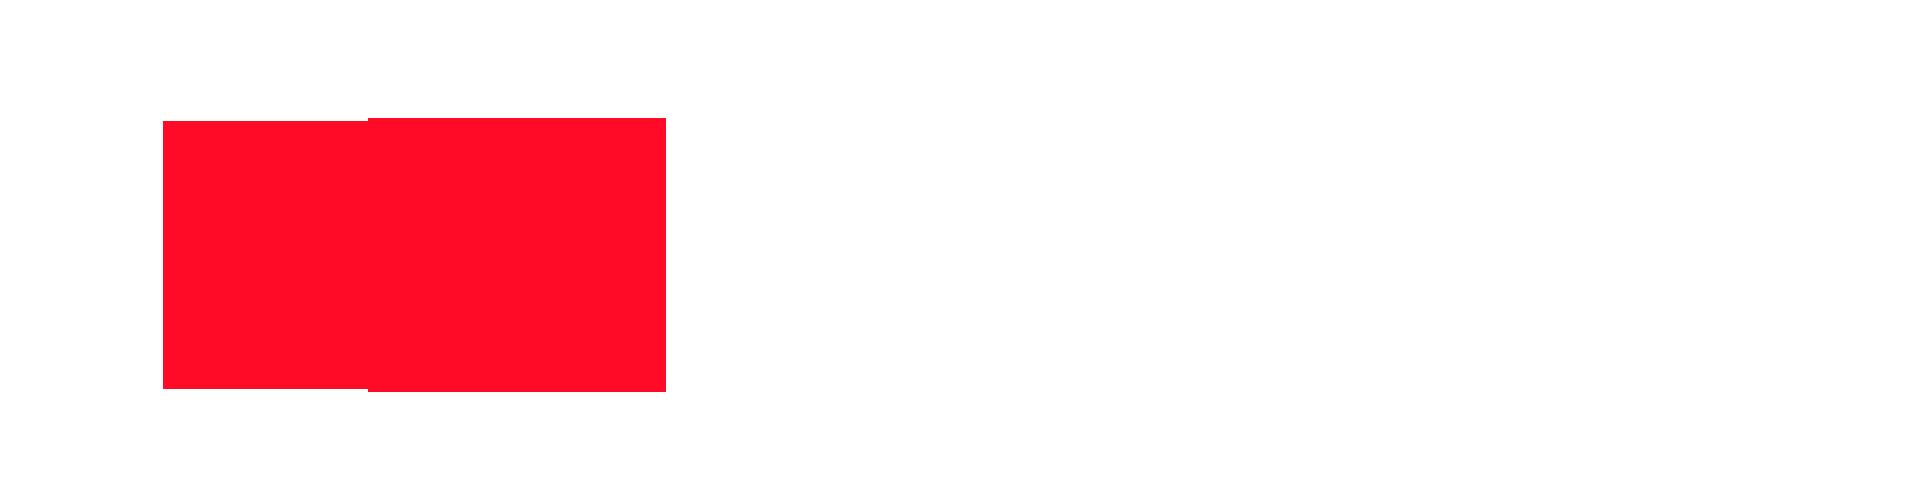 banner-design-01